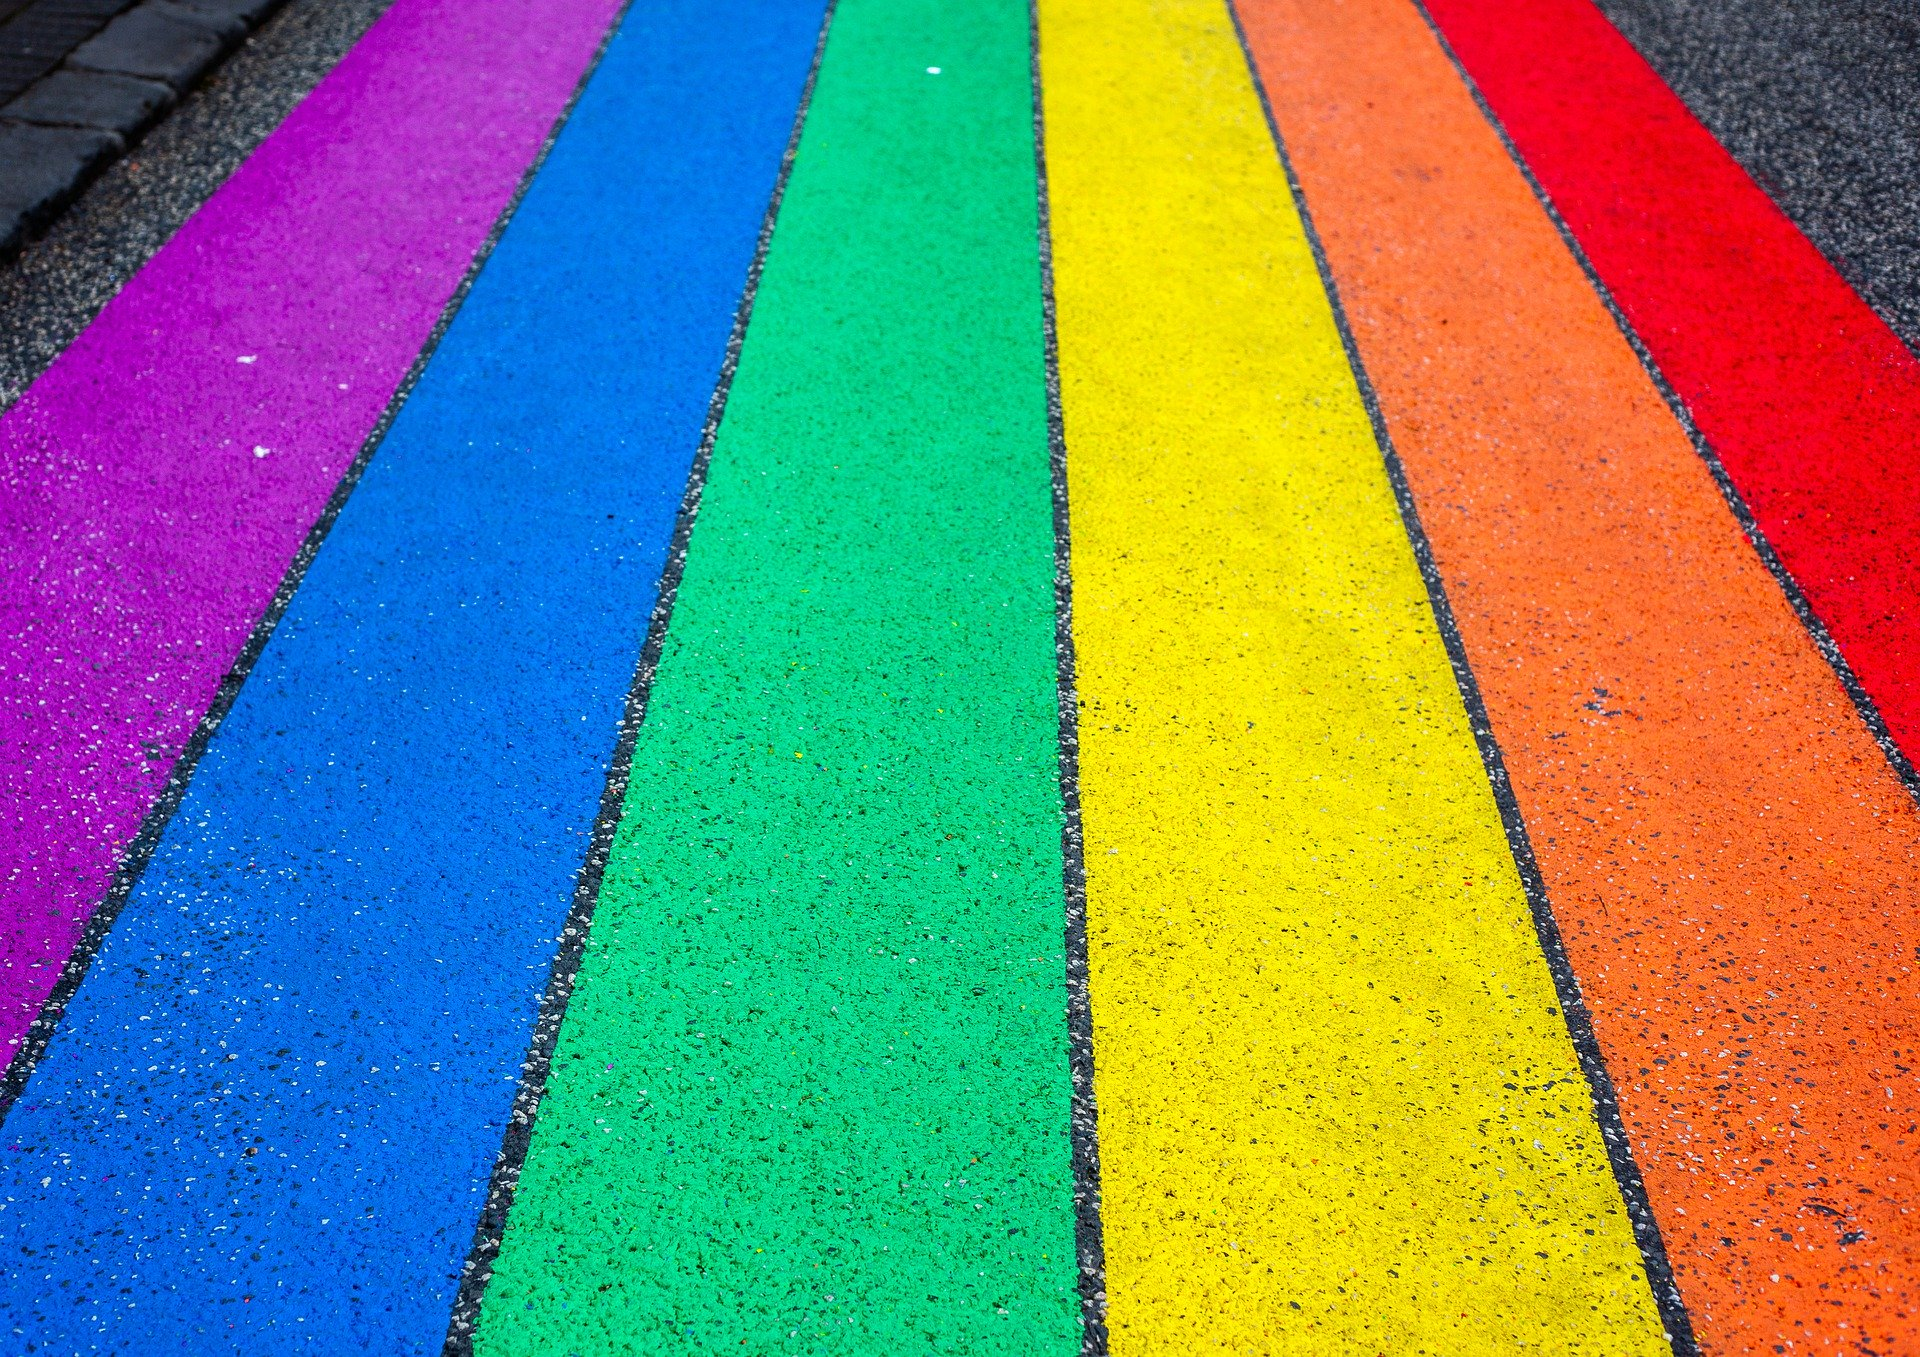 Tinder Releases 'Pride Anthem' For Indian LGBTQ Community